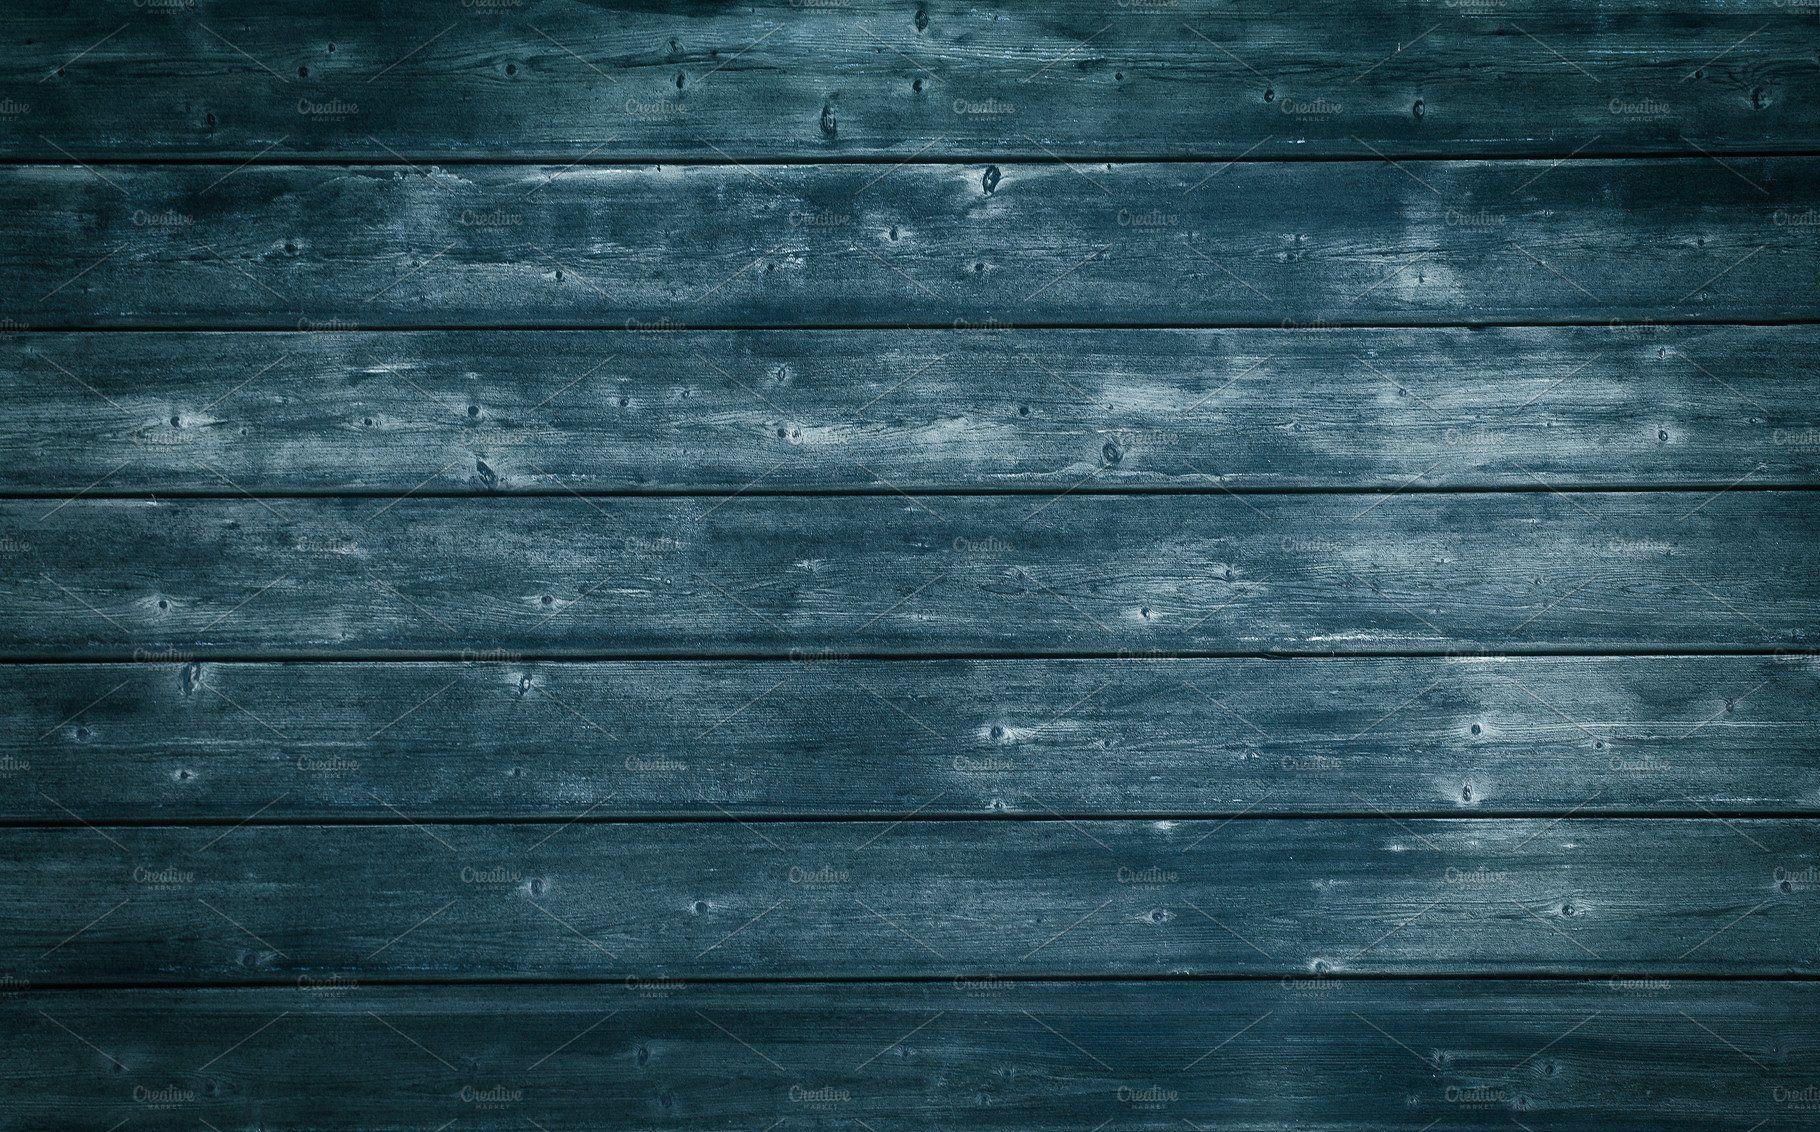 Rustic Wood Background Navy Blue Rustic Wood Wallpaper Rustic Wood Background Wood Background